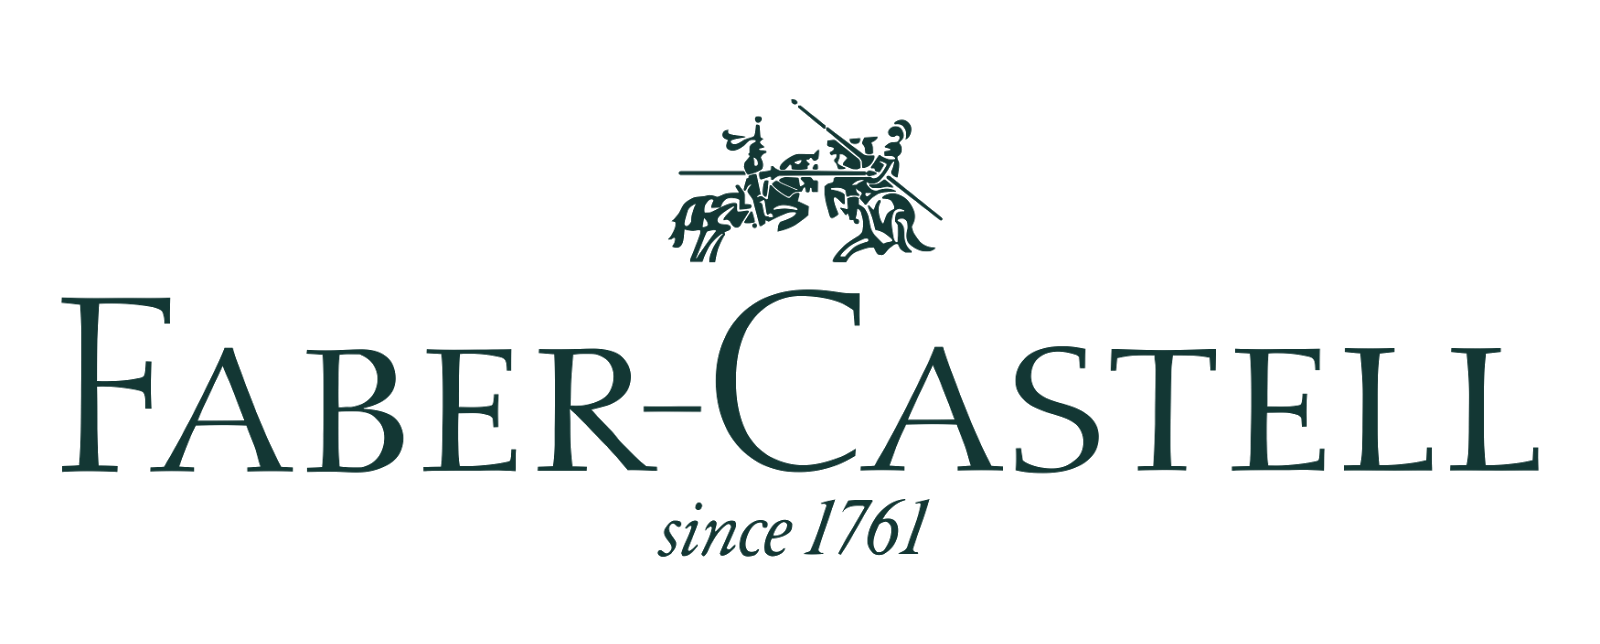 faber-castell-vector-logo